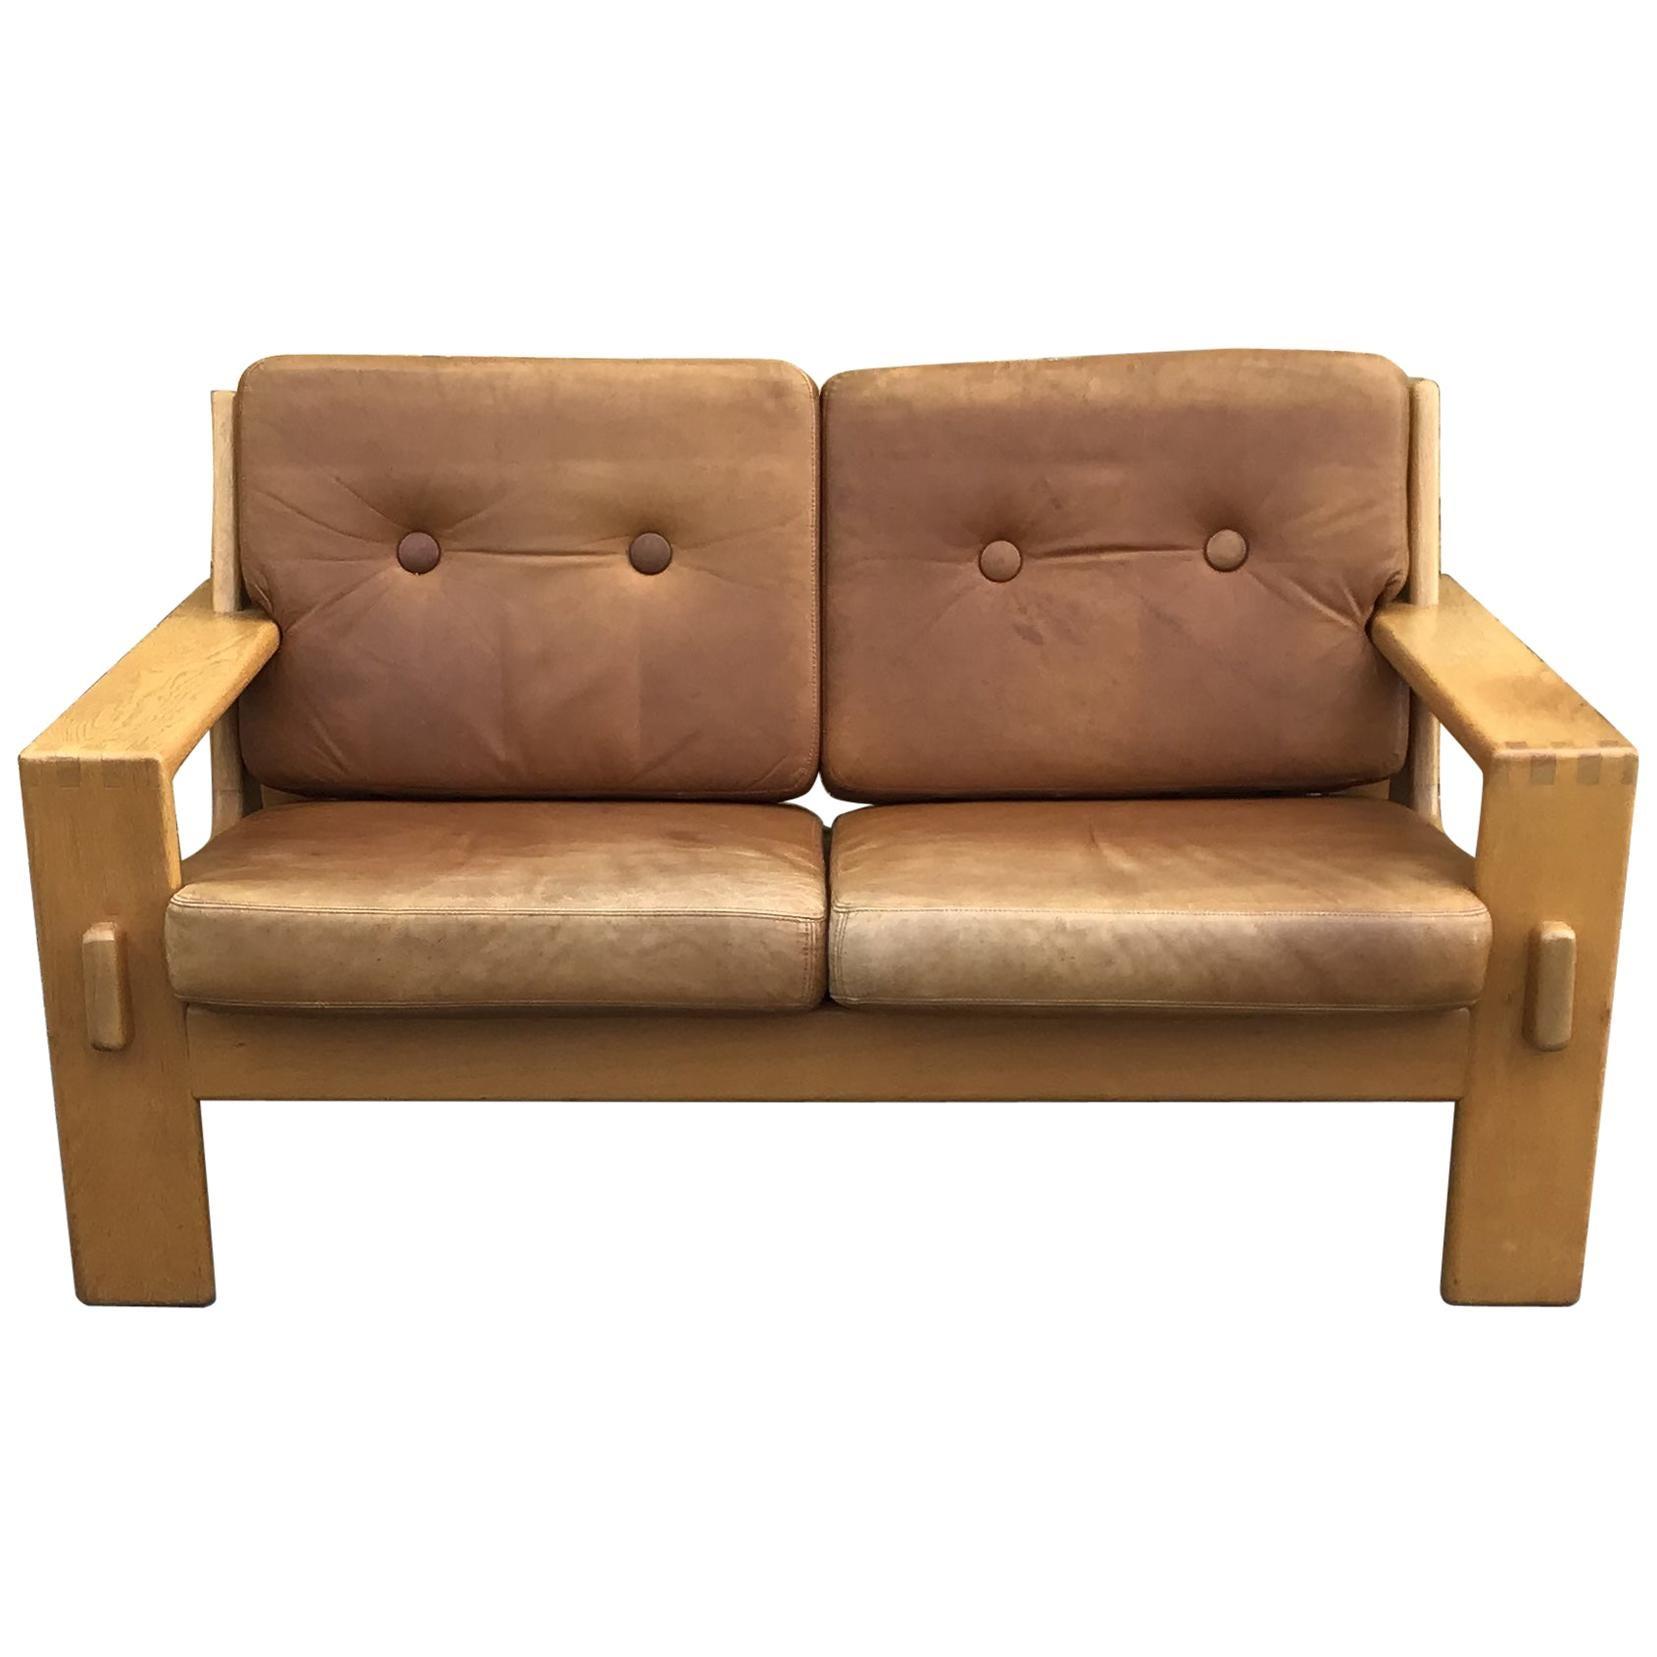 1960s Bonanza 2-Seat Sofa by Esko Pajamies for Asko